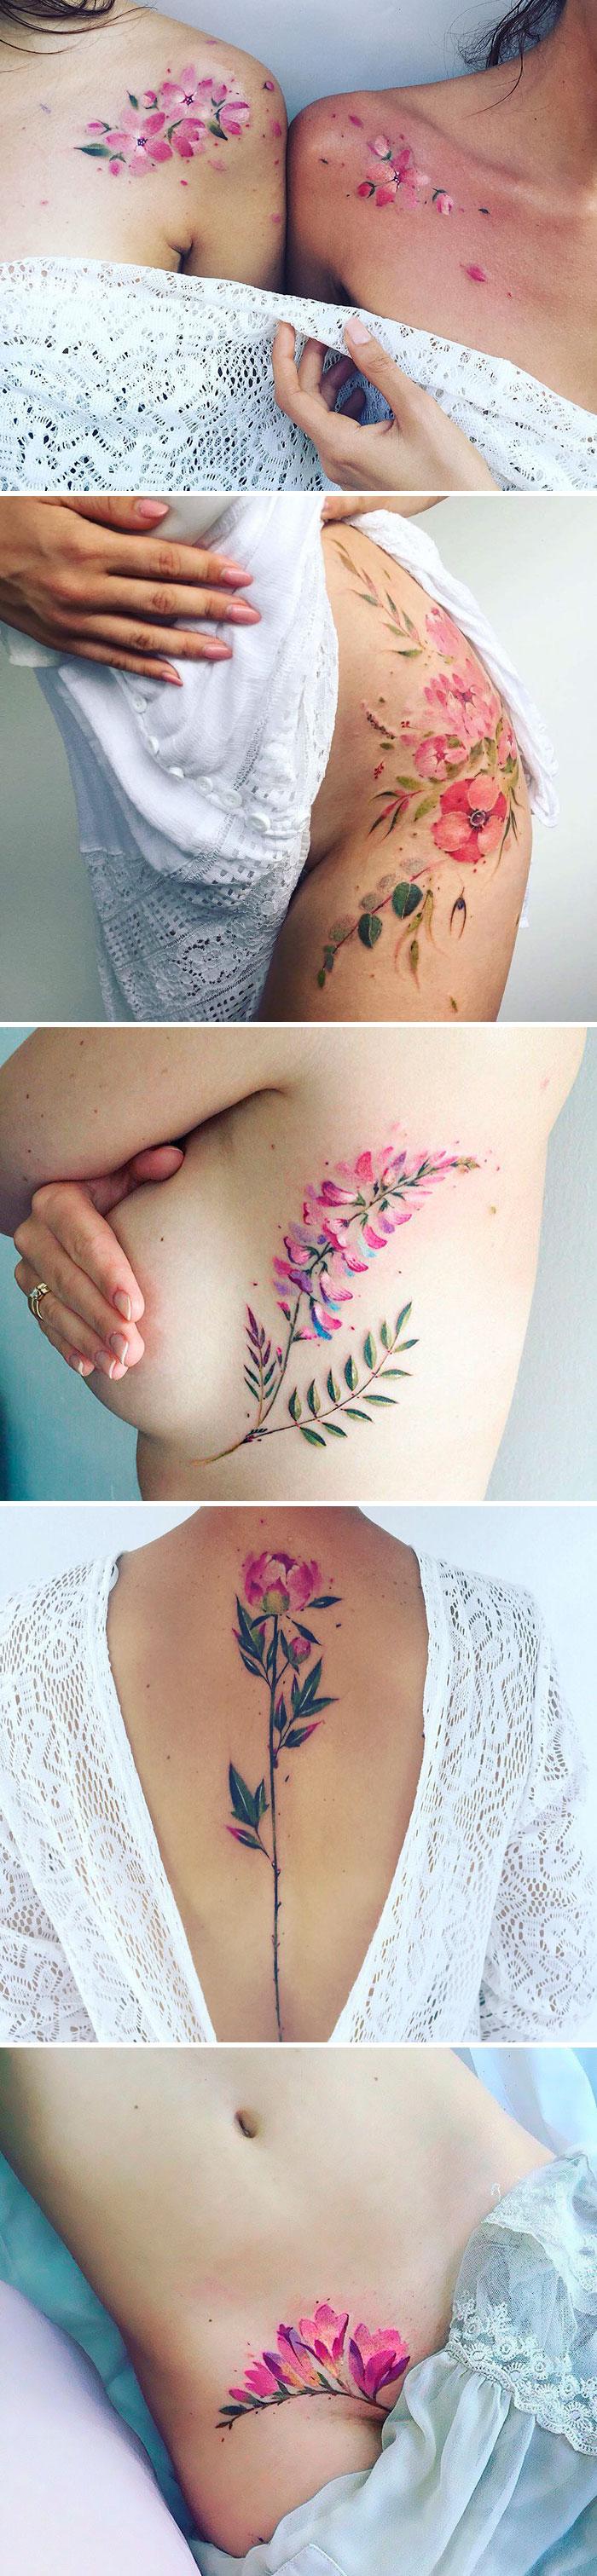 tatuagens-florais (3)